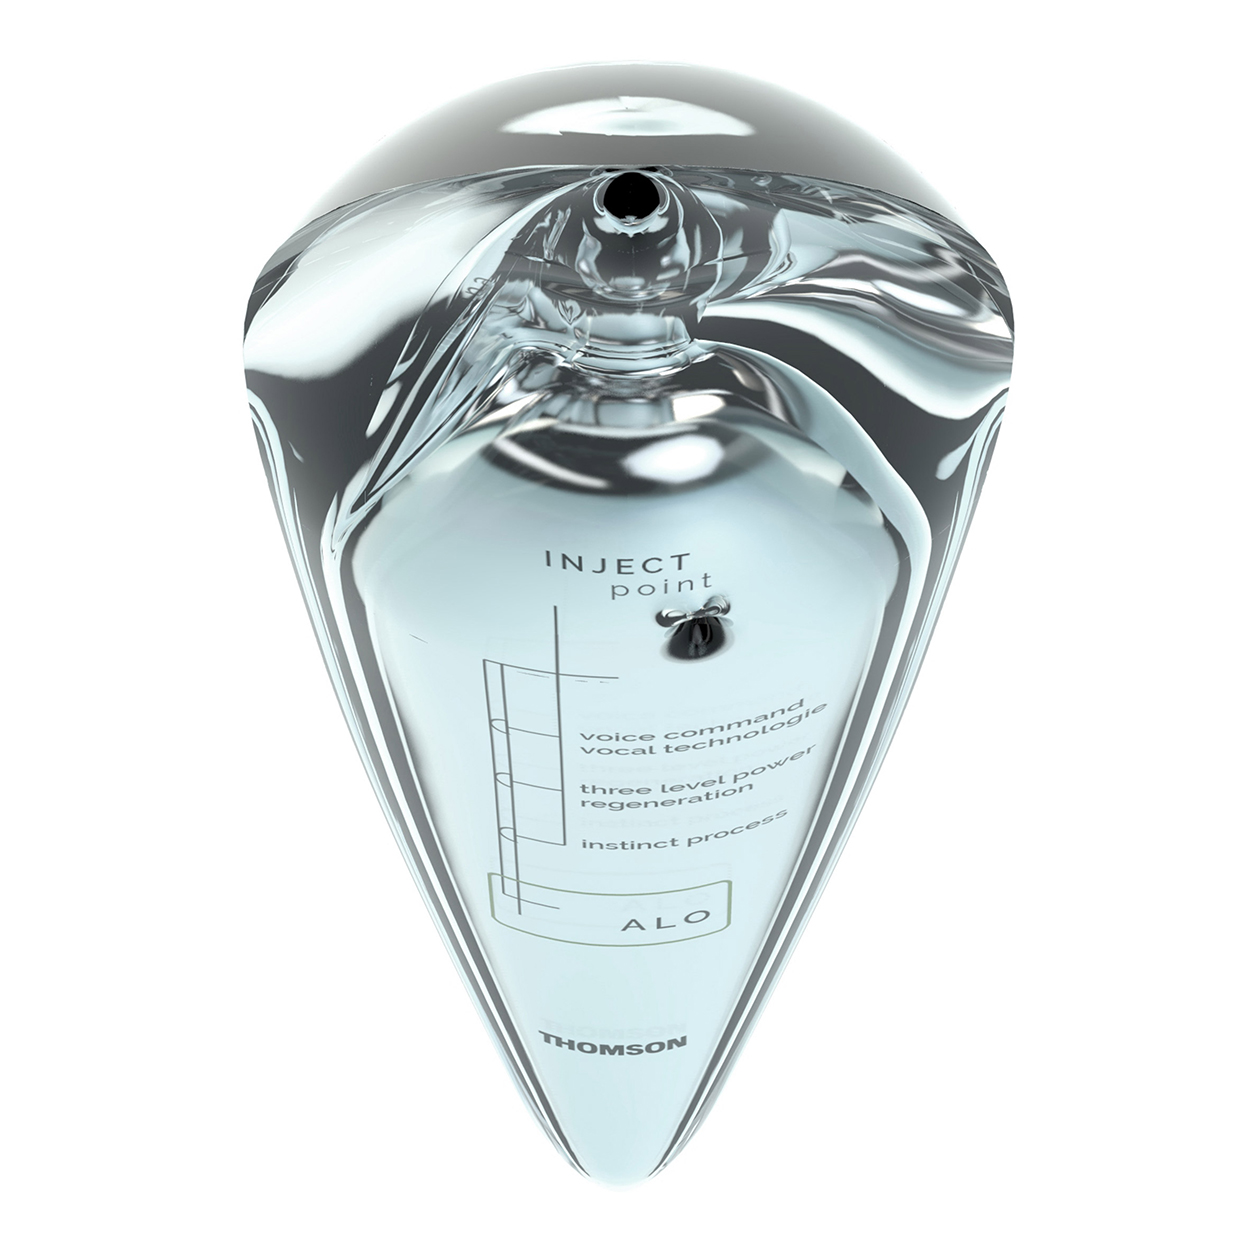 Tasarım - Endüstriyel Tasarım - Cep Telefonu - Philippe Starck - Jerome Olivet - Konsept